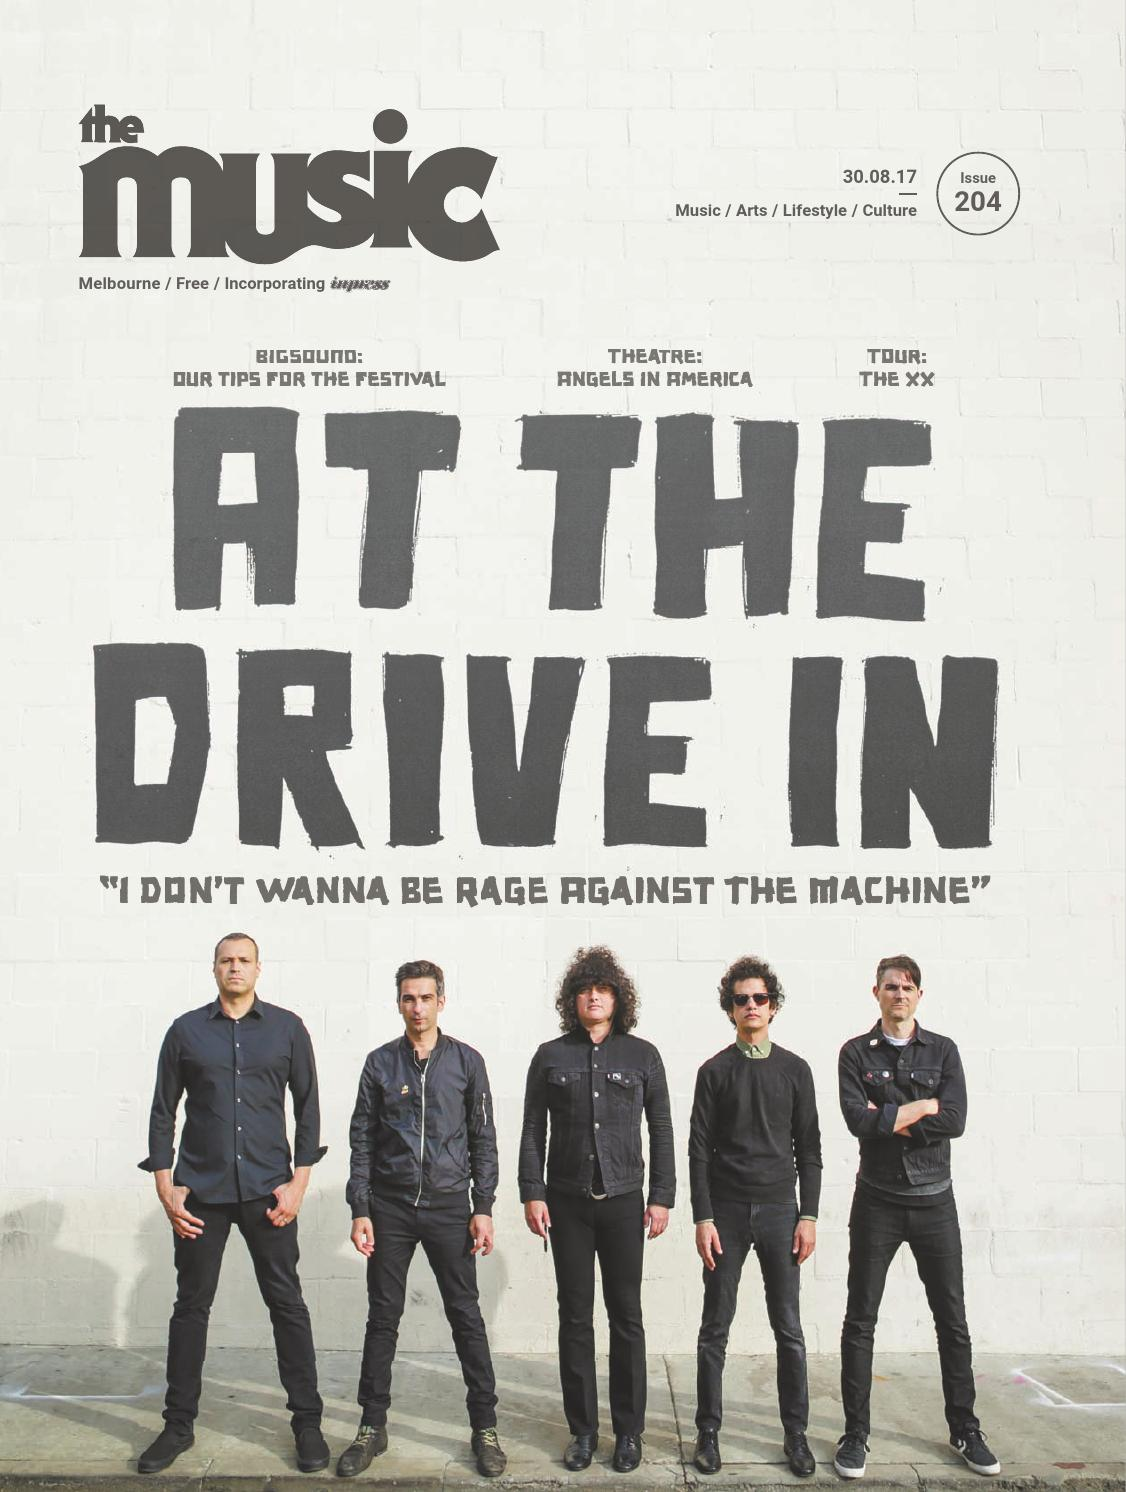 dd22effe The Music (Melbourne) Issue #204 by TheMusic.com.au - issuu